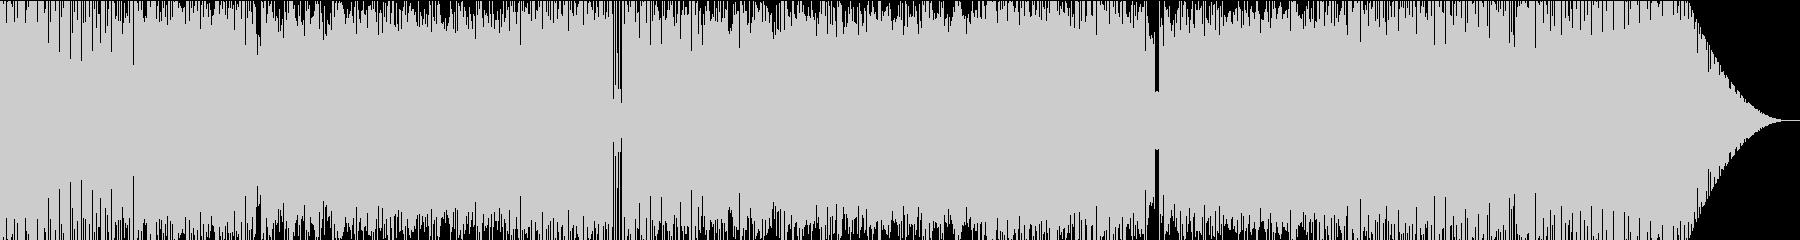 EDM系のポップなインストの未再生の波形